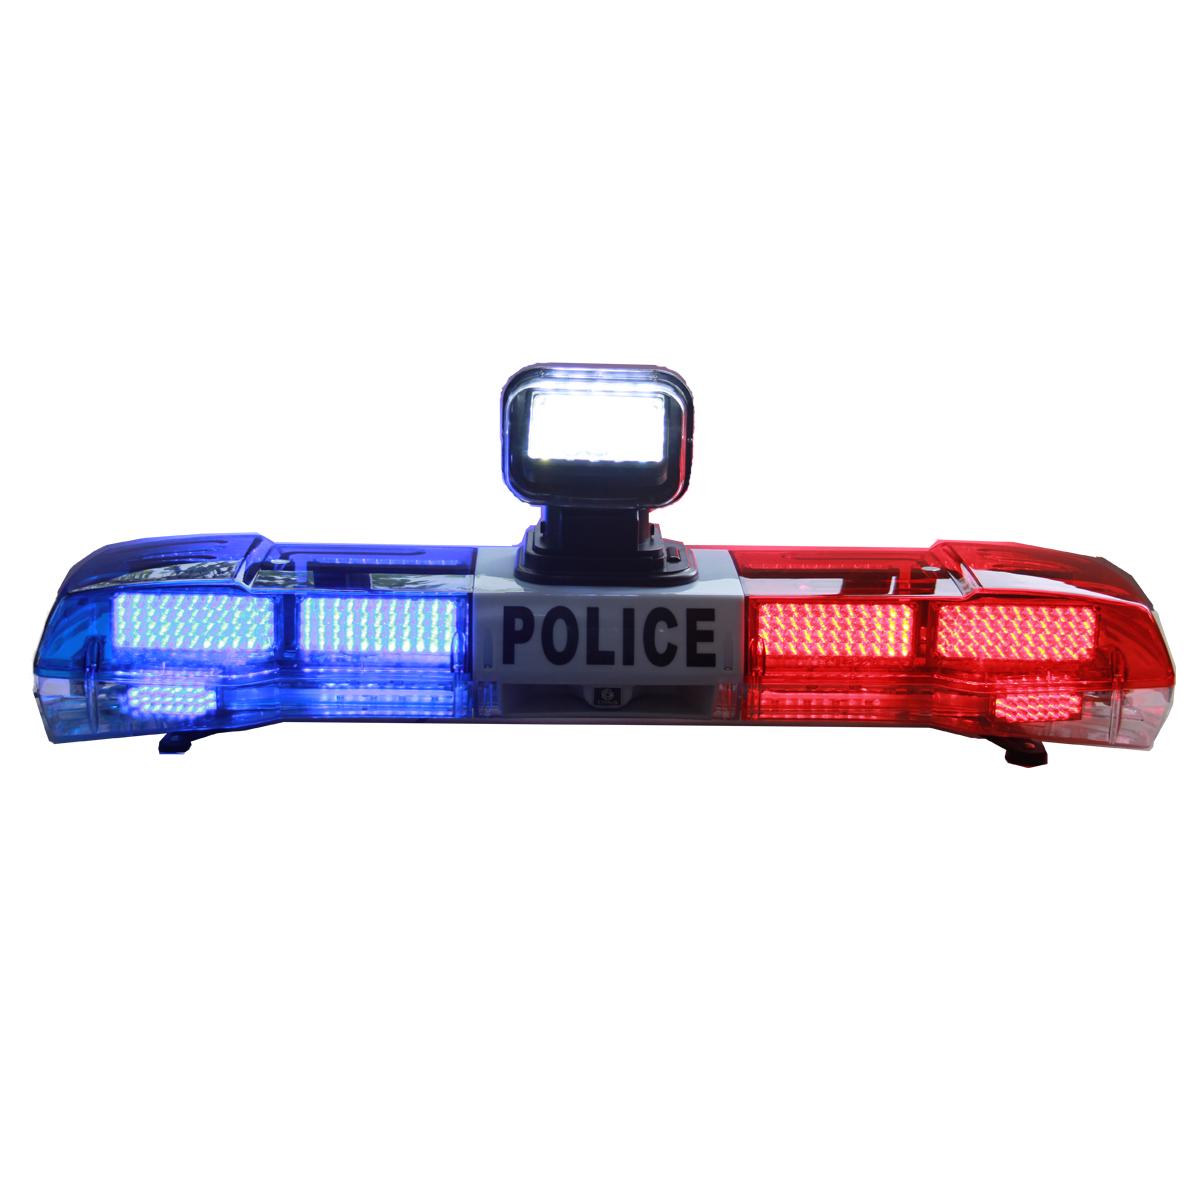 TBD-9000 工字型LED长排灯带探照灯